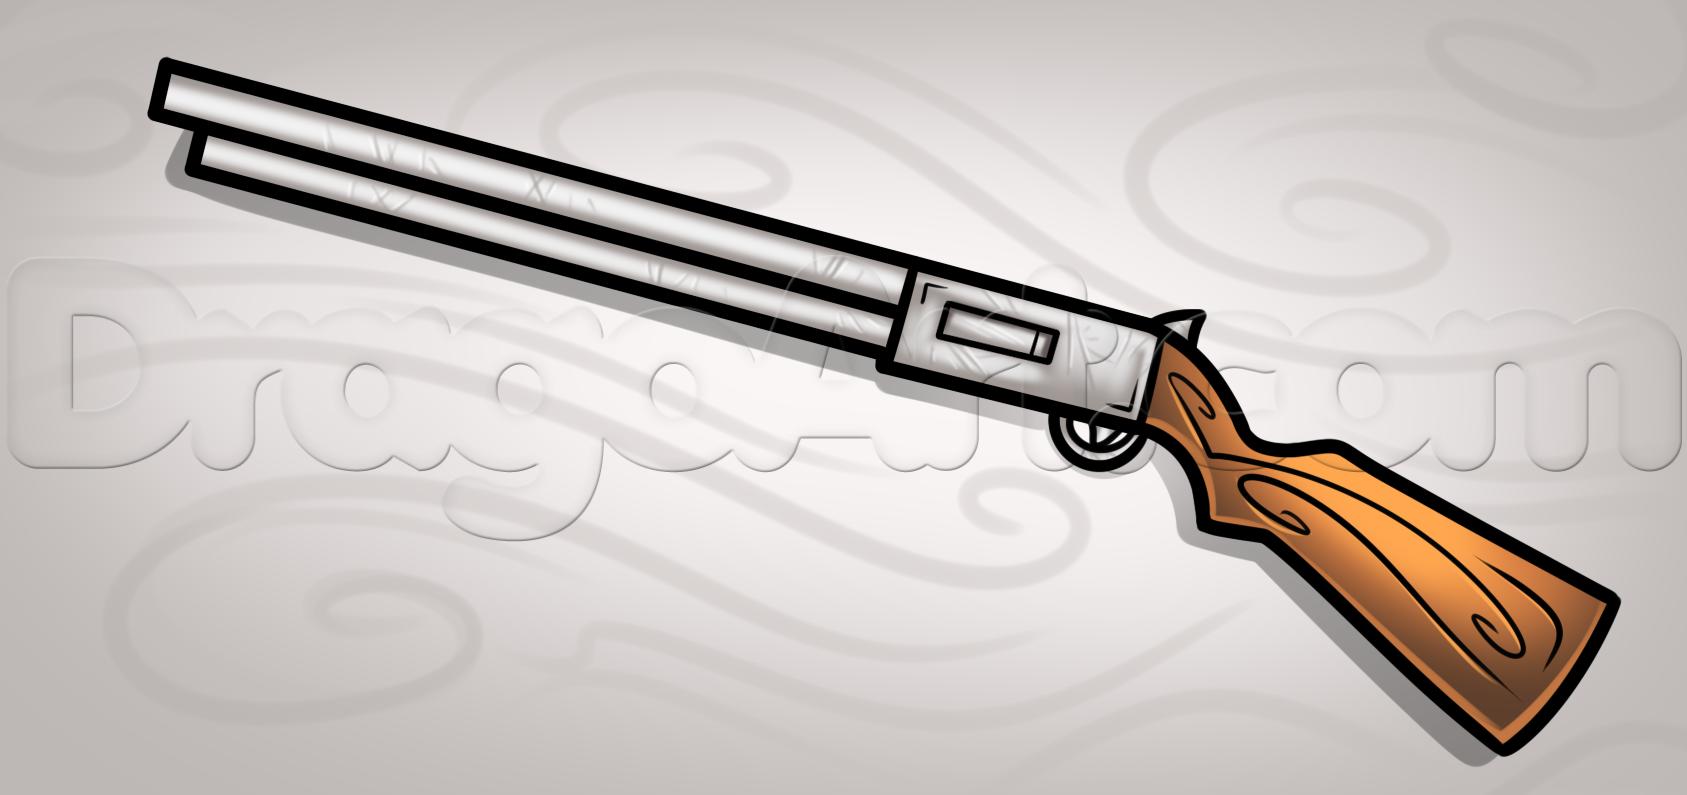 Drawn shotgun draw a Easy easy Pinterest to Stuff